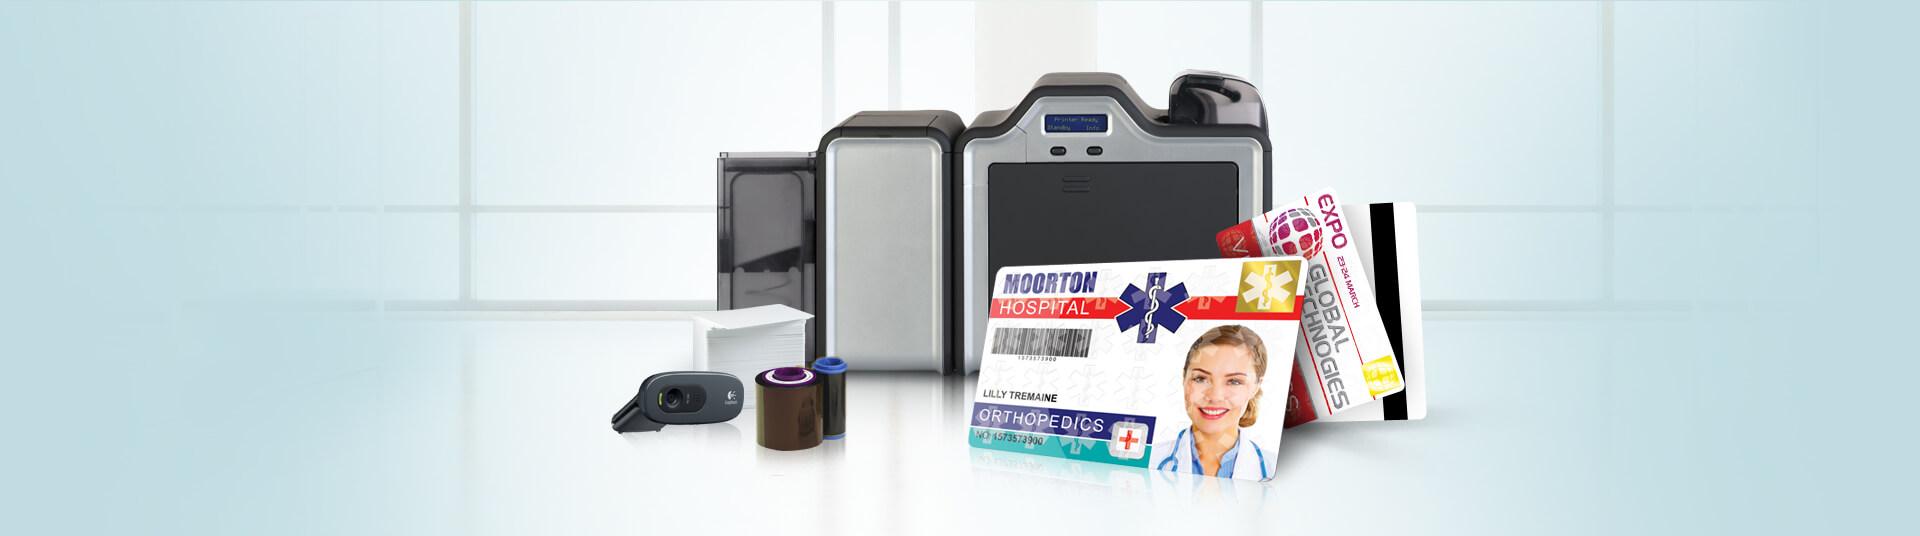 Laminating ID Card Systems